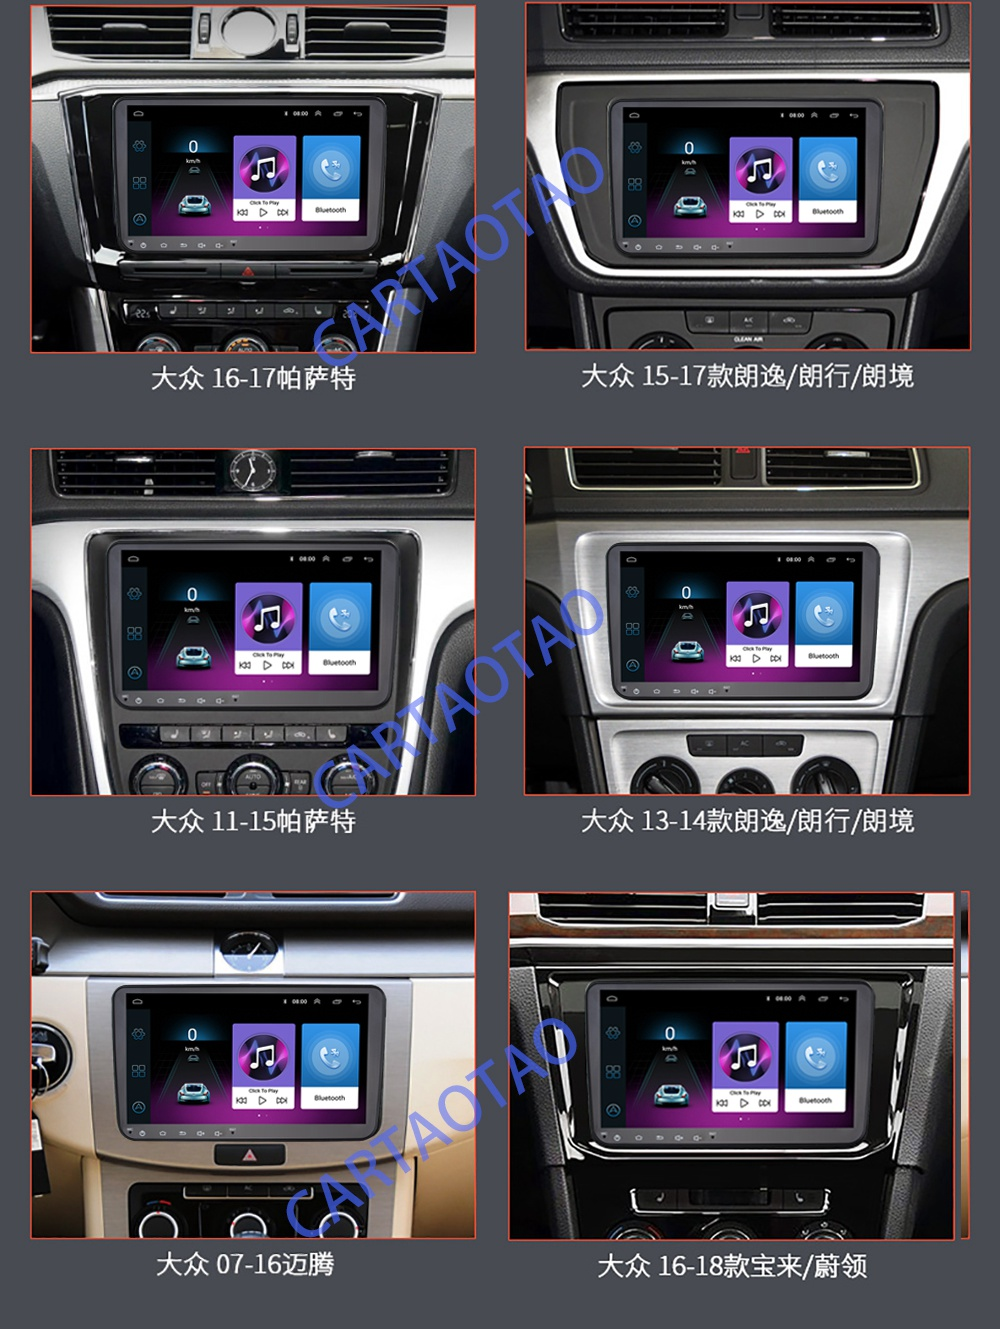 "Image 4 - 9 ""2din Android 8.1 GO автомобильный радиоприемник GPS навигатор для Volkswagen Skoda Octavia Golf 5 6 Турана Passat B6 Jetta Поло Tiguan стерео WIFI-in Мультимедиаплеер для авто from Автомобили и мотоциклы on AliExpress - 11.11_Double 11_Singles' Day"